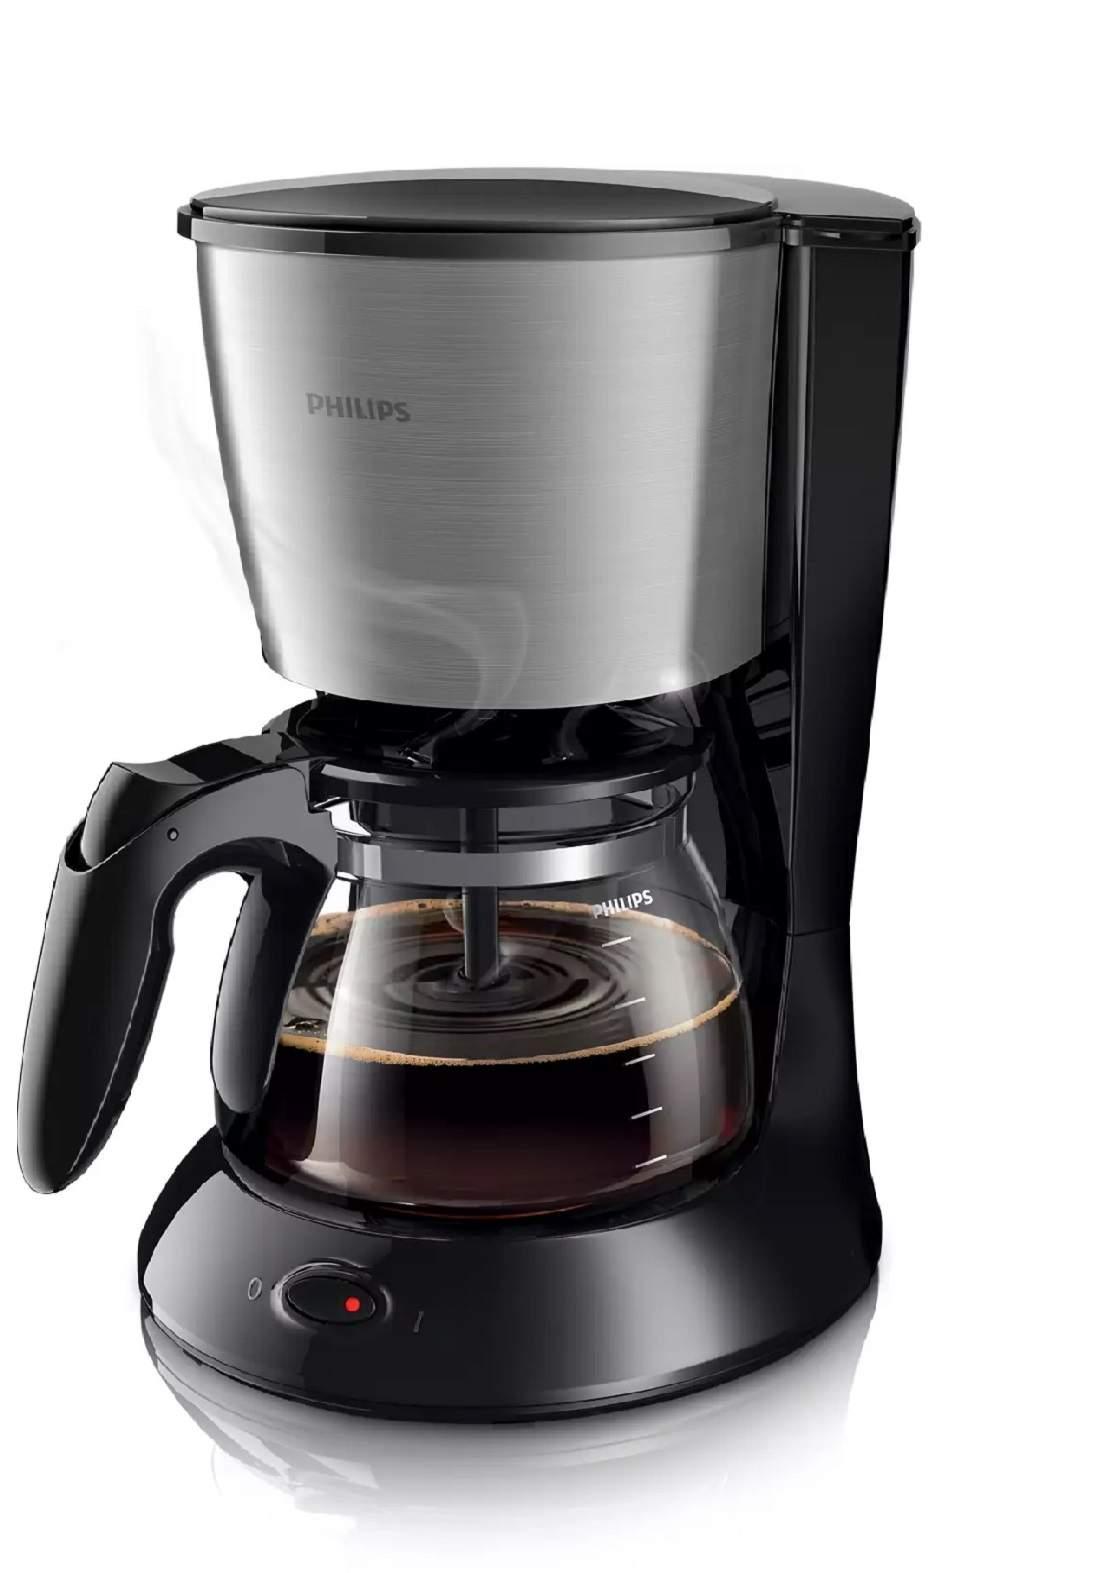 Philips HR7457 Daily Collection Coffee maker 1000 W ماكنة تحضير القهوة